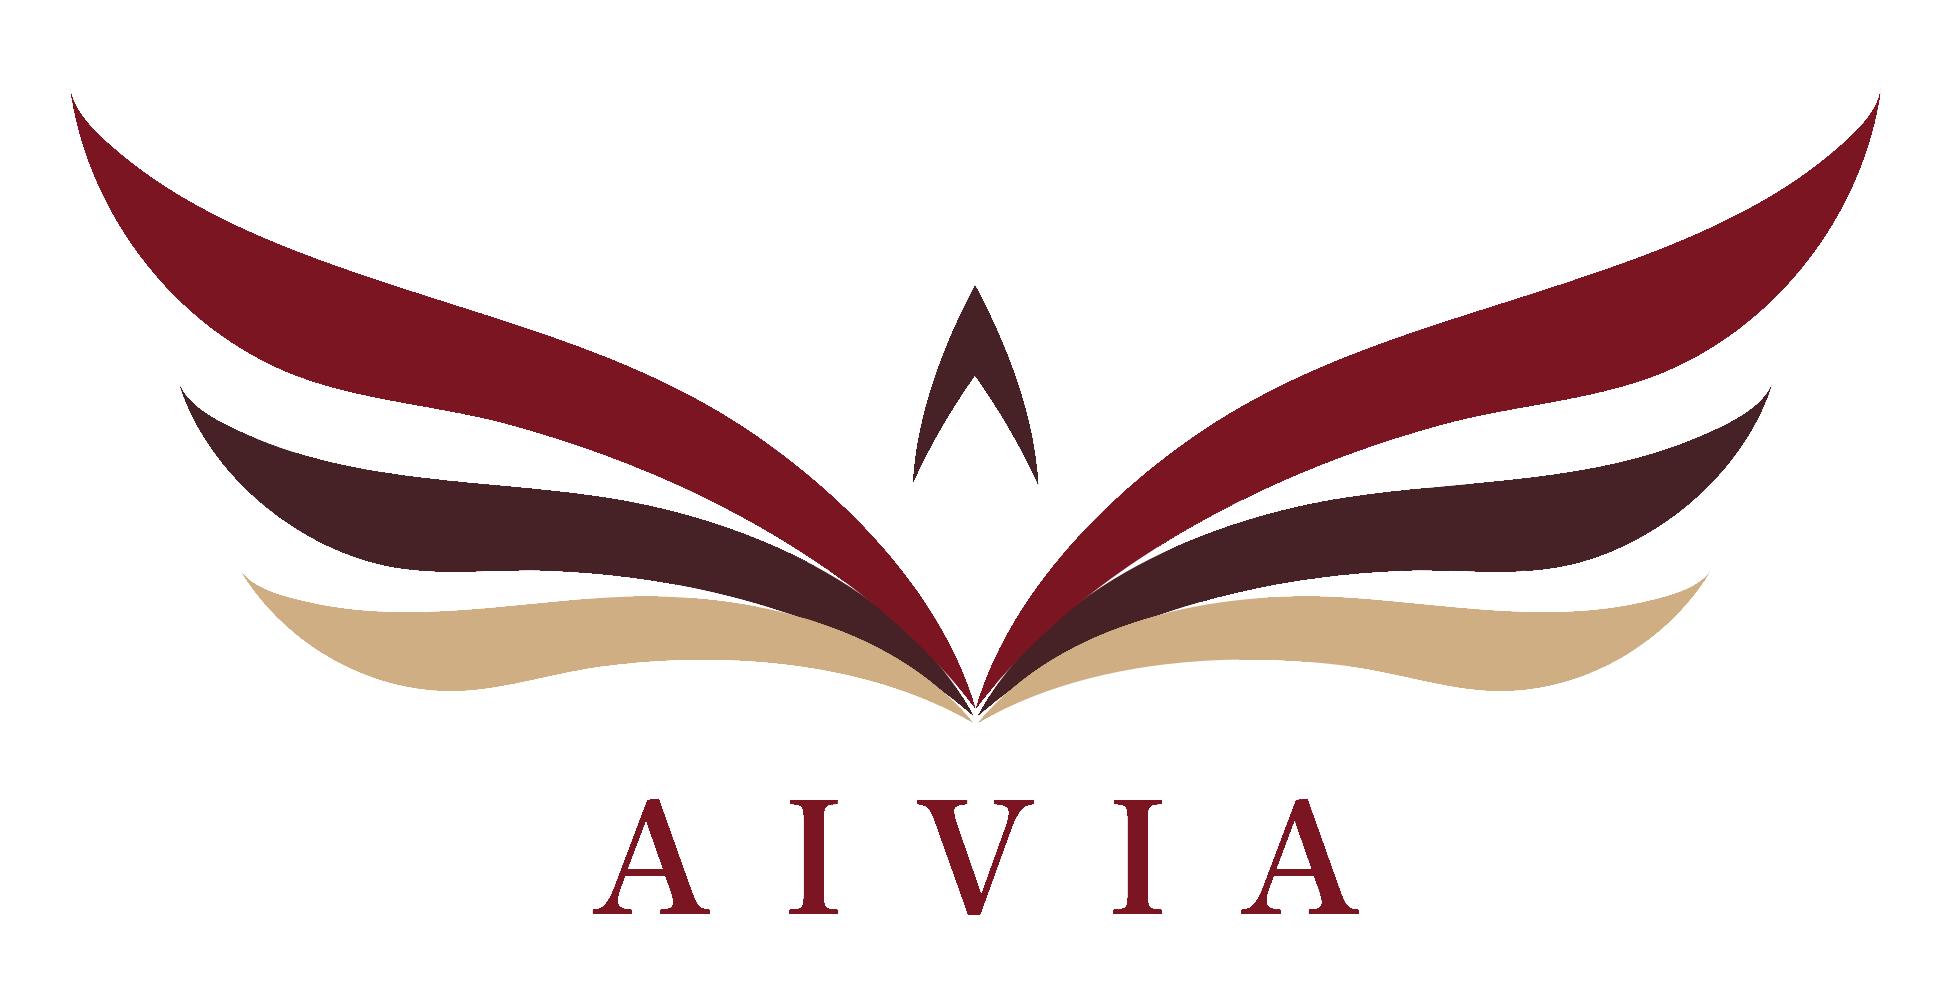 Aivia Group